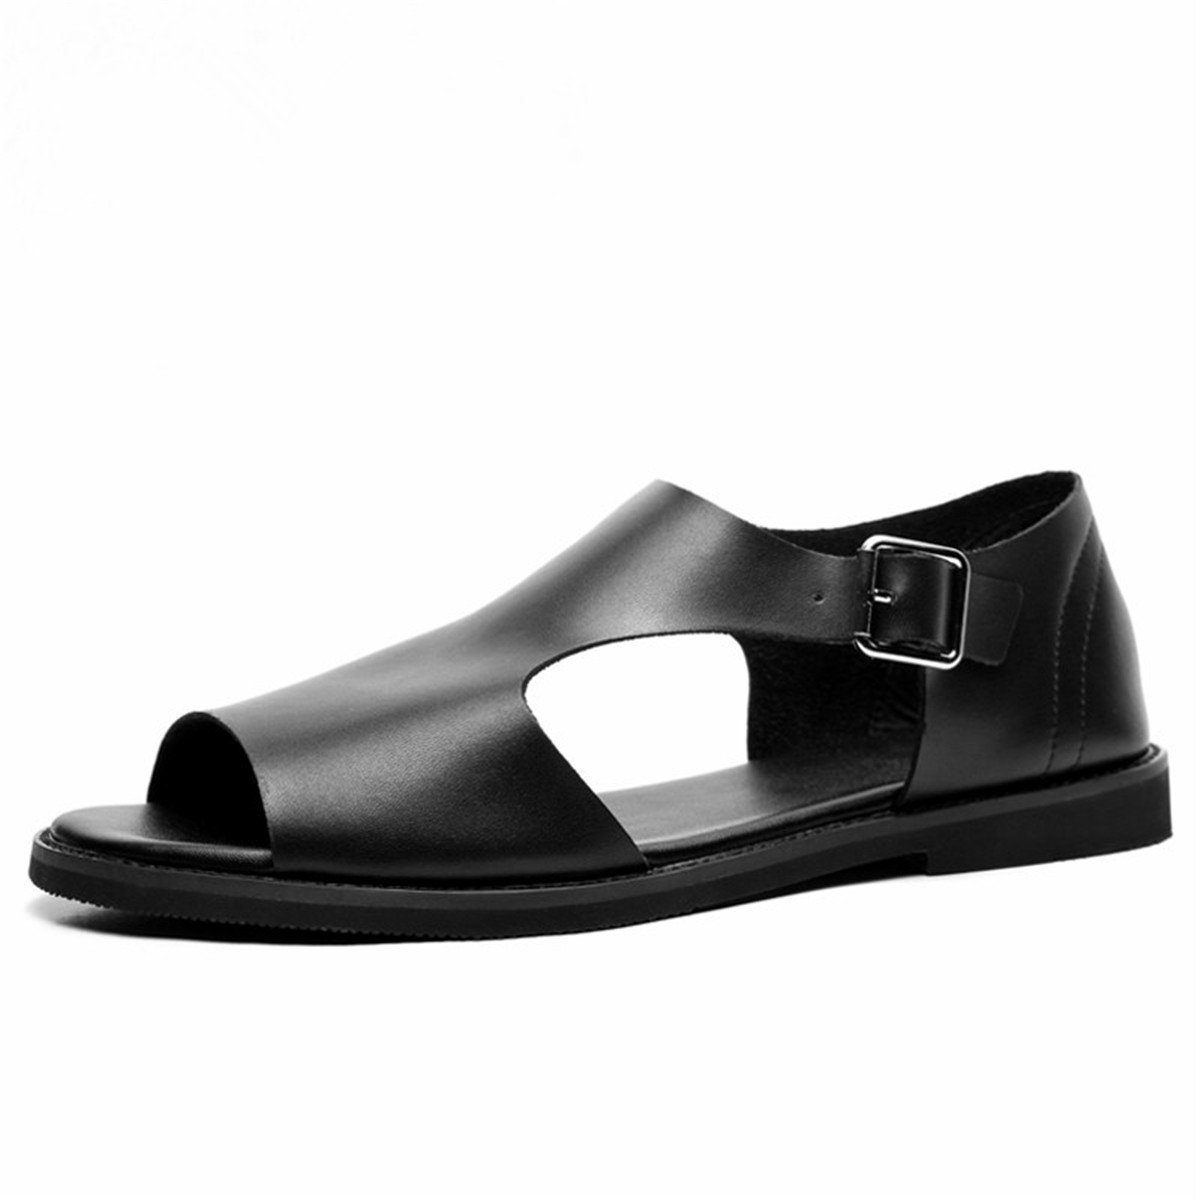 innovative design c274b 4b9ef ... Nutsima Summer Men s Sandals Sandals Sandals Leather Simple Black  Comfortable Men Beach Shoes Gladiator Open- ...